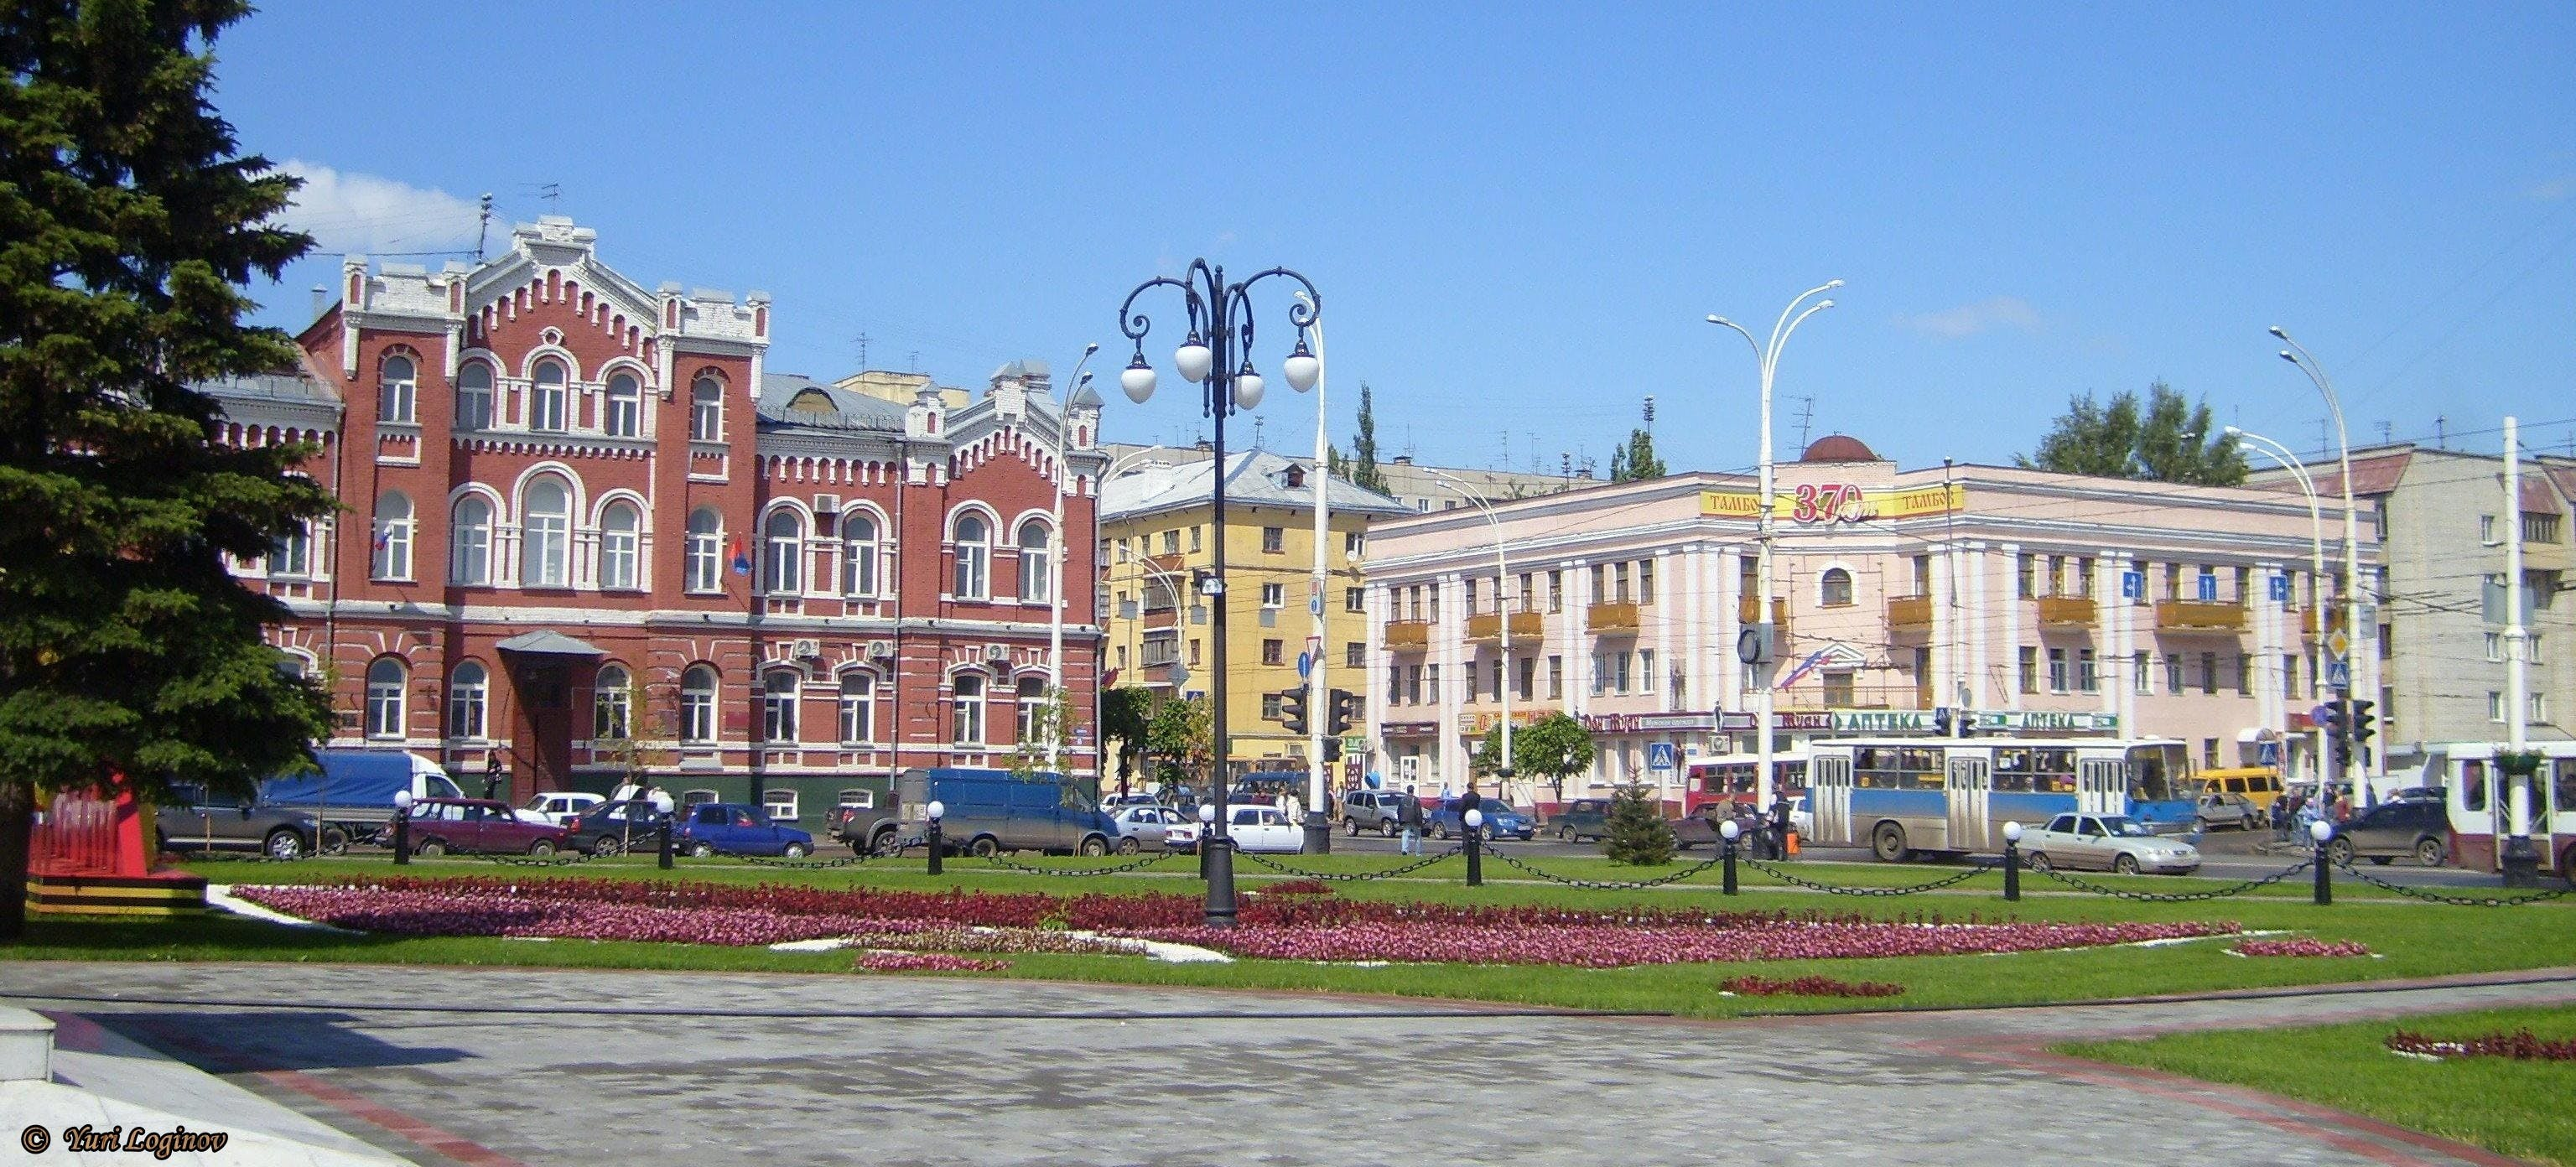 Free stock photo of russia, россия, Тамбов, Tambov